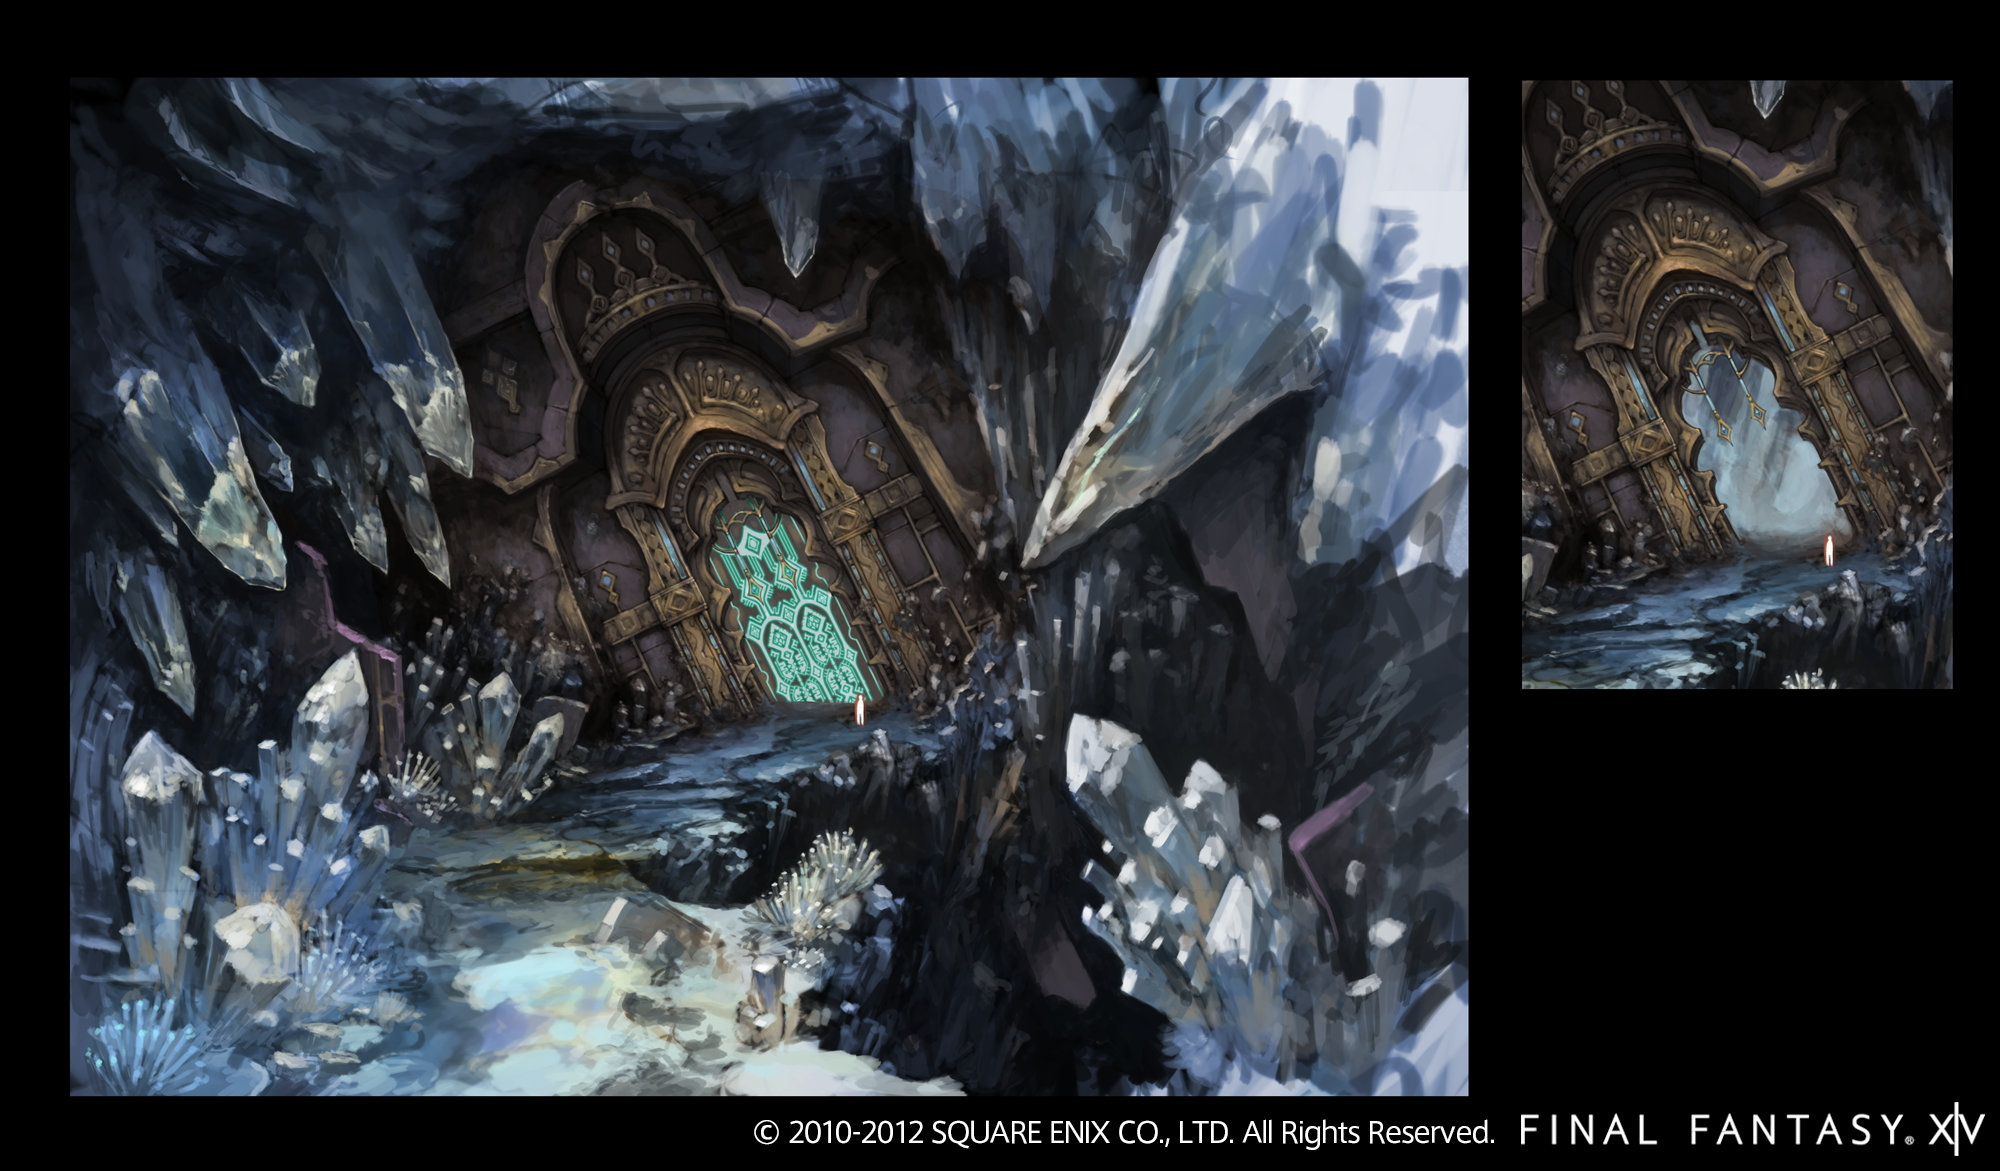 Fantasy XIV A Realm Reborn Computer Wallpapers Desktop Backgrounds 2000x1171